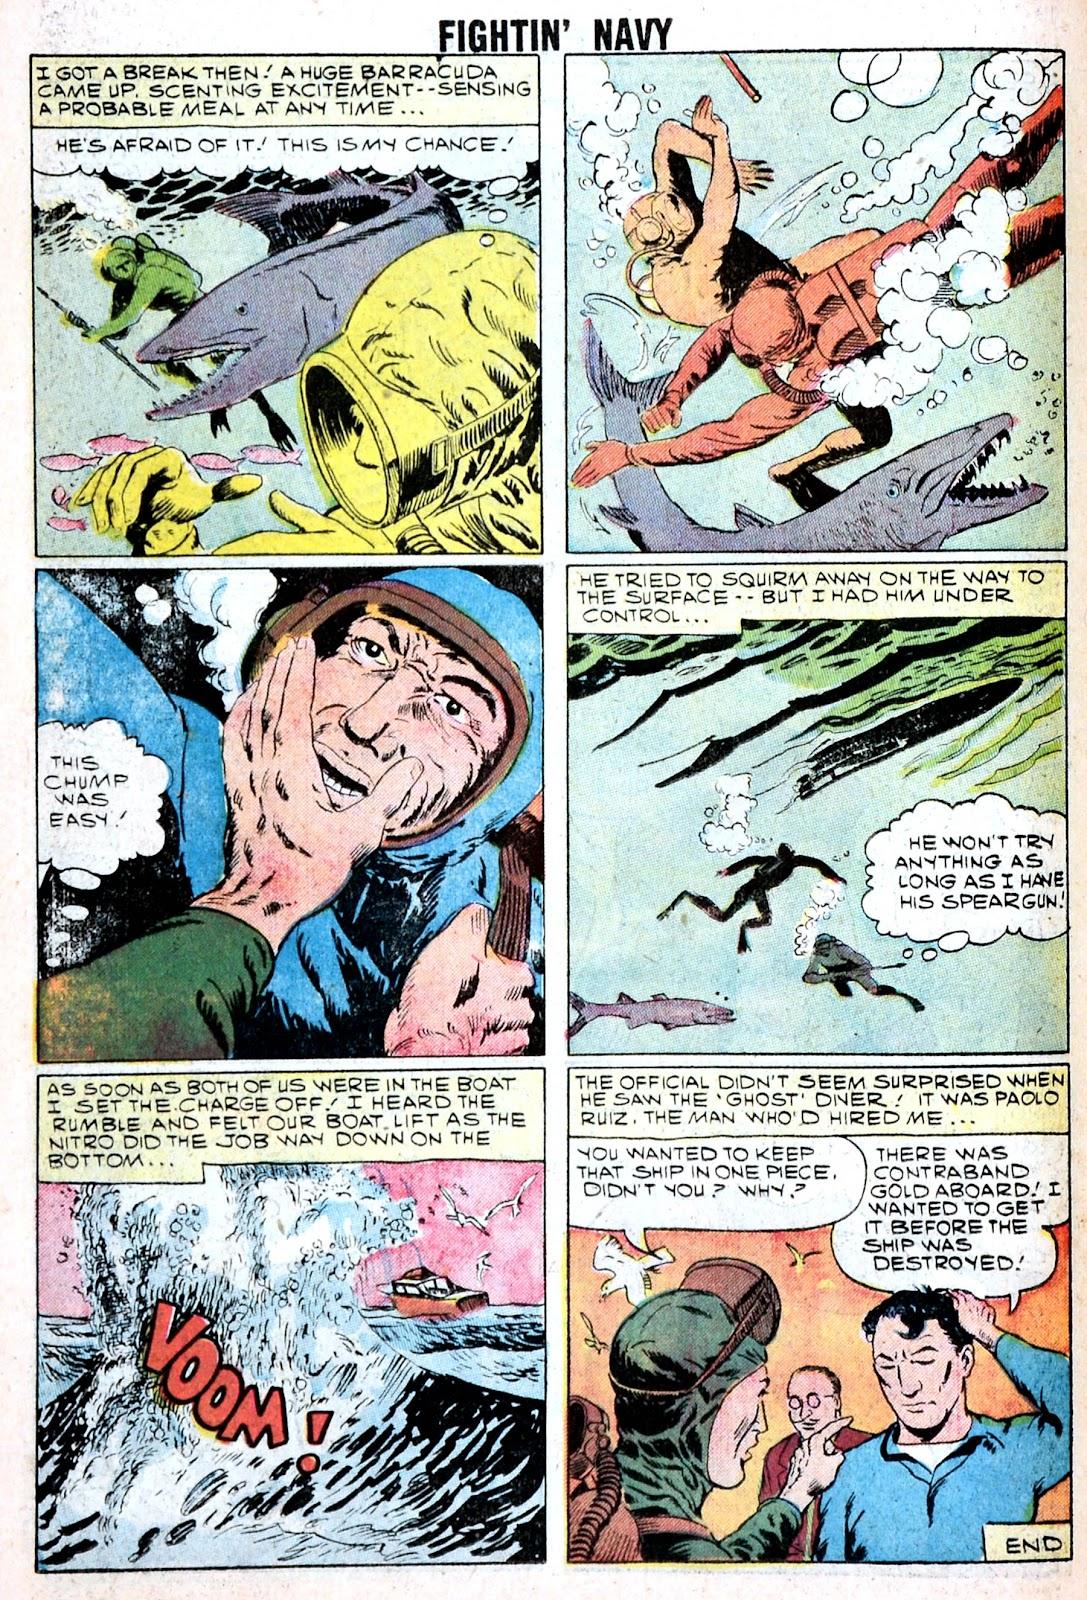 Read online Fightin' Navy comic -  Issue #85 - 26